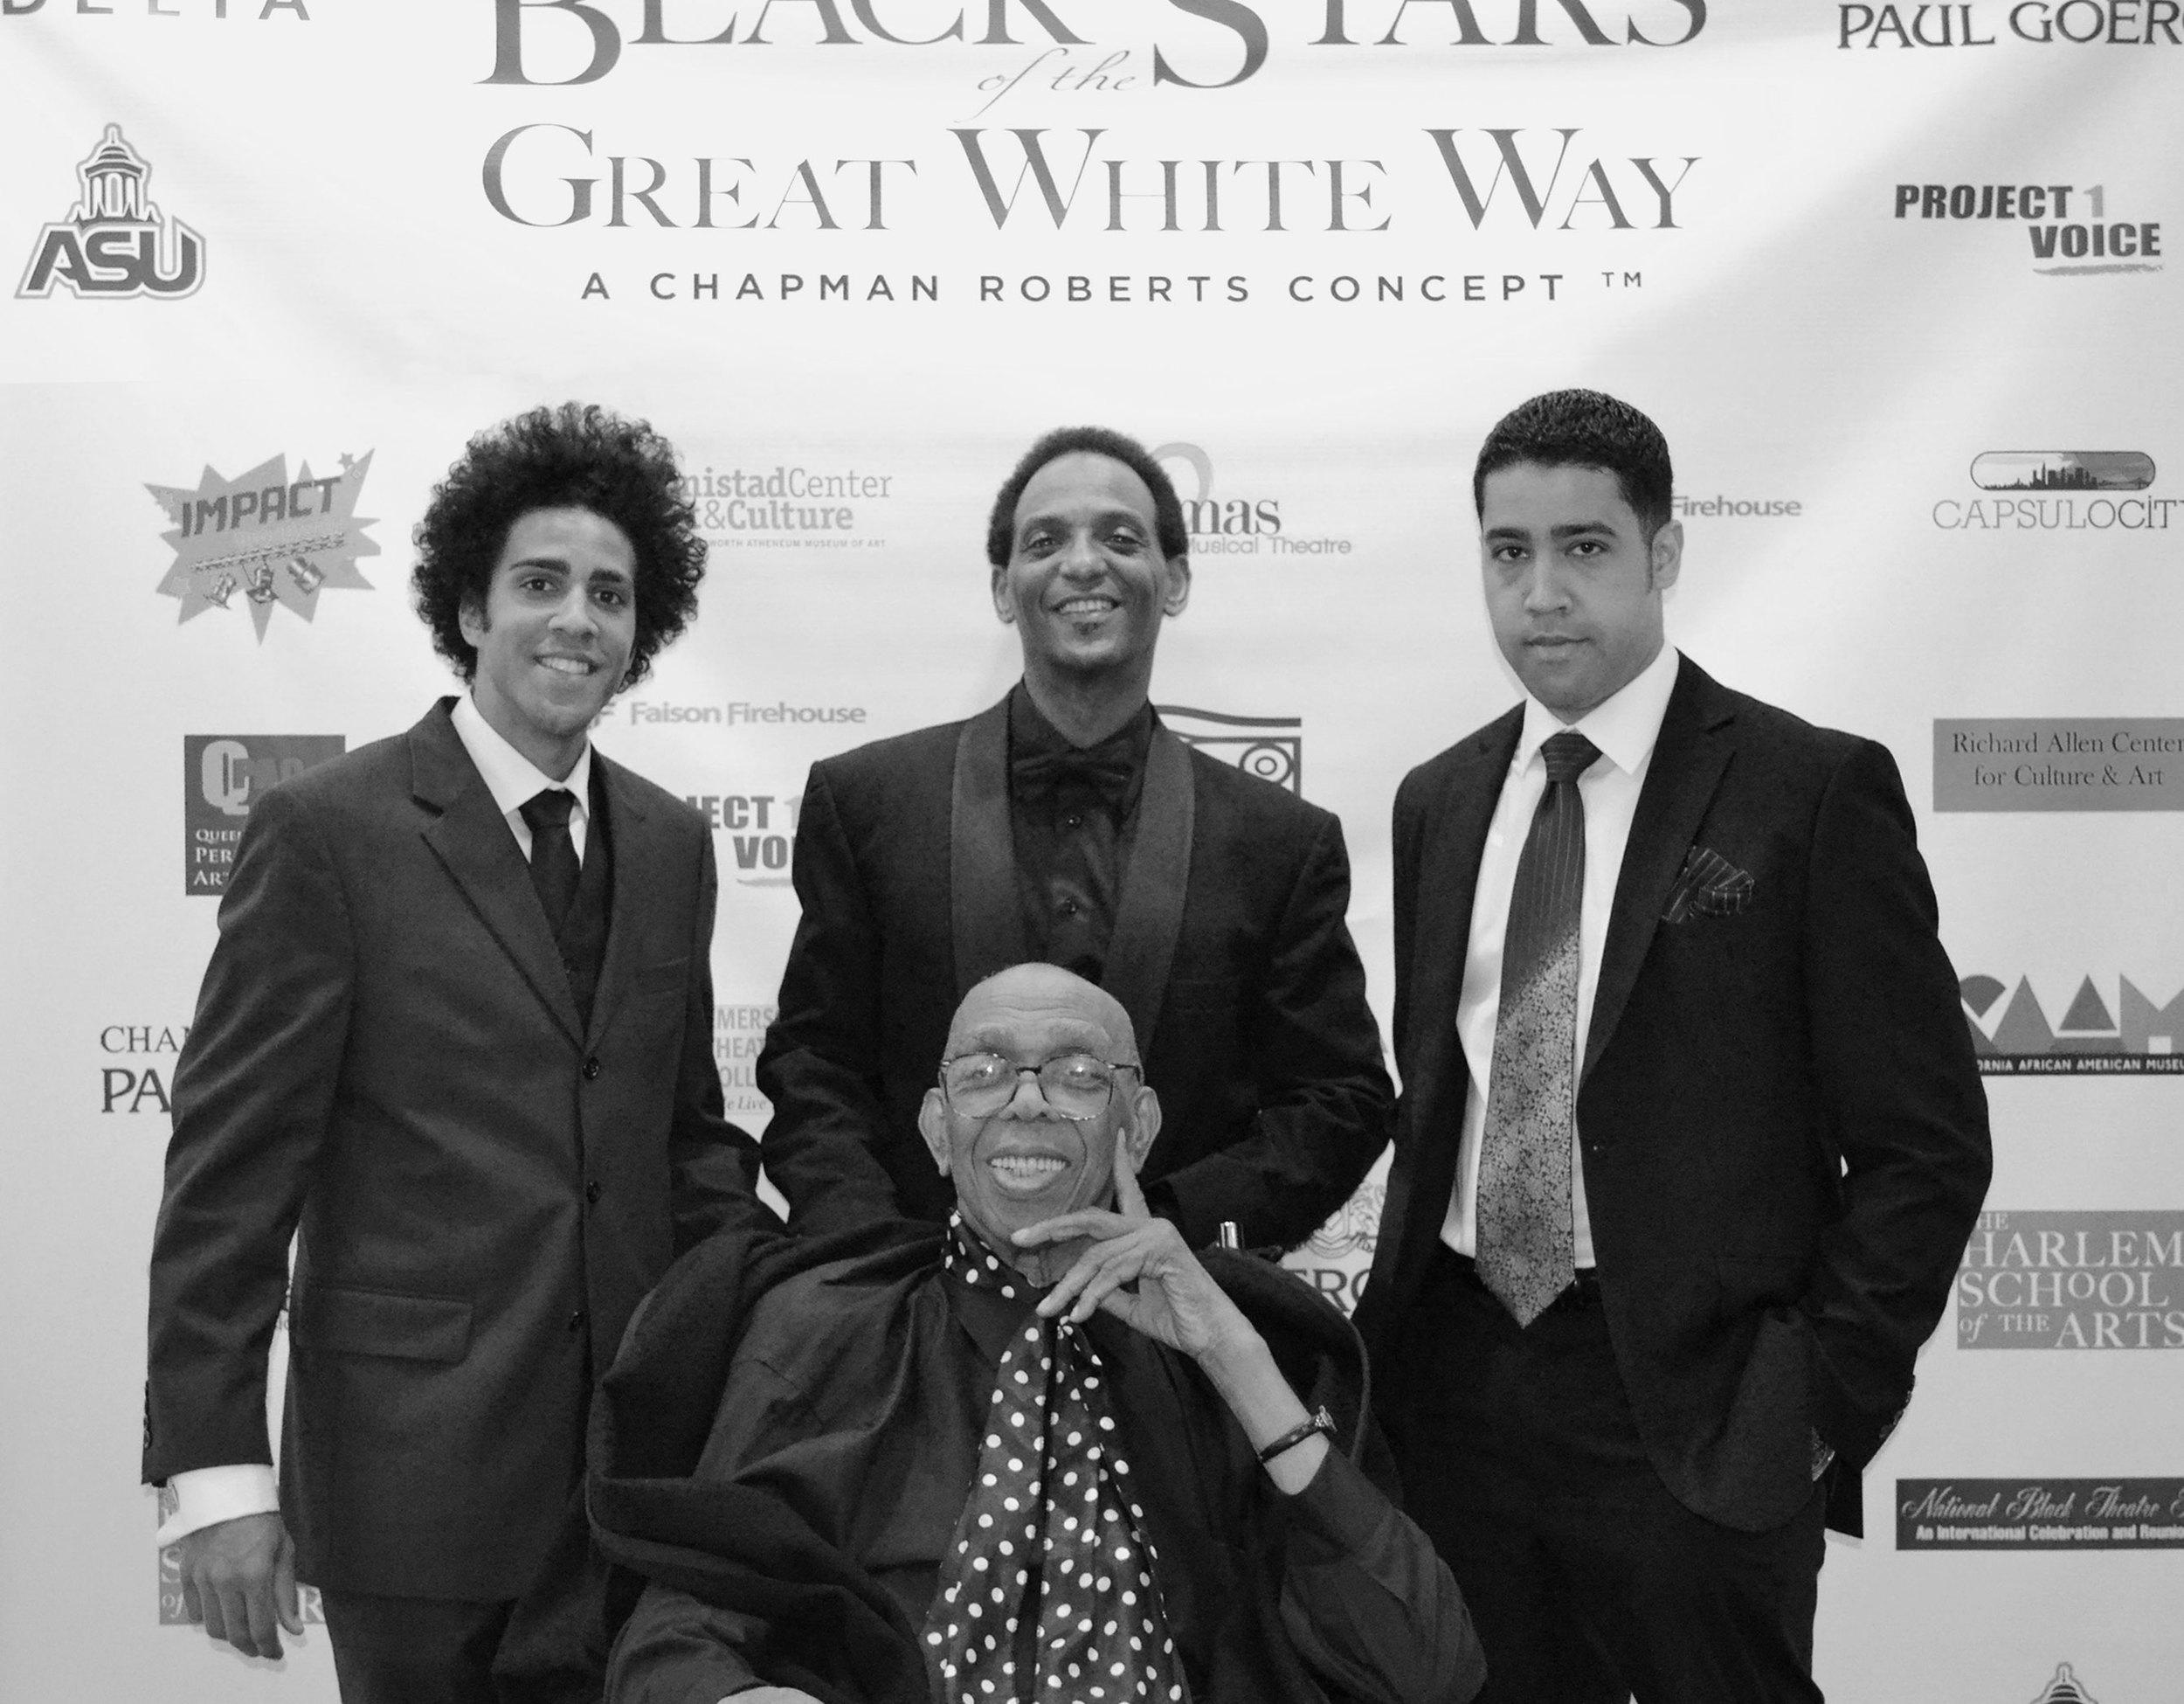 center: Geoffrey Holder | right to left: Roger Derrick, Franklin West and Edmund Derrick